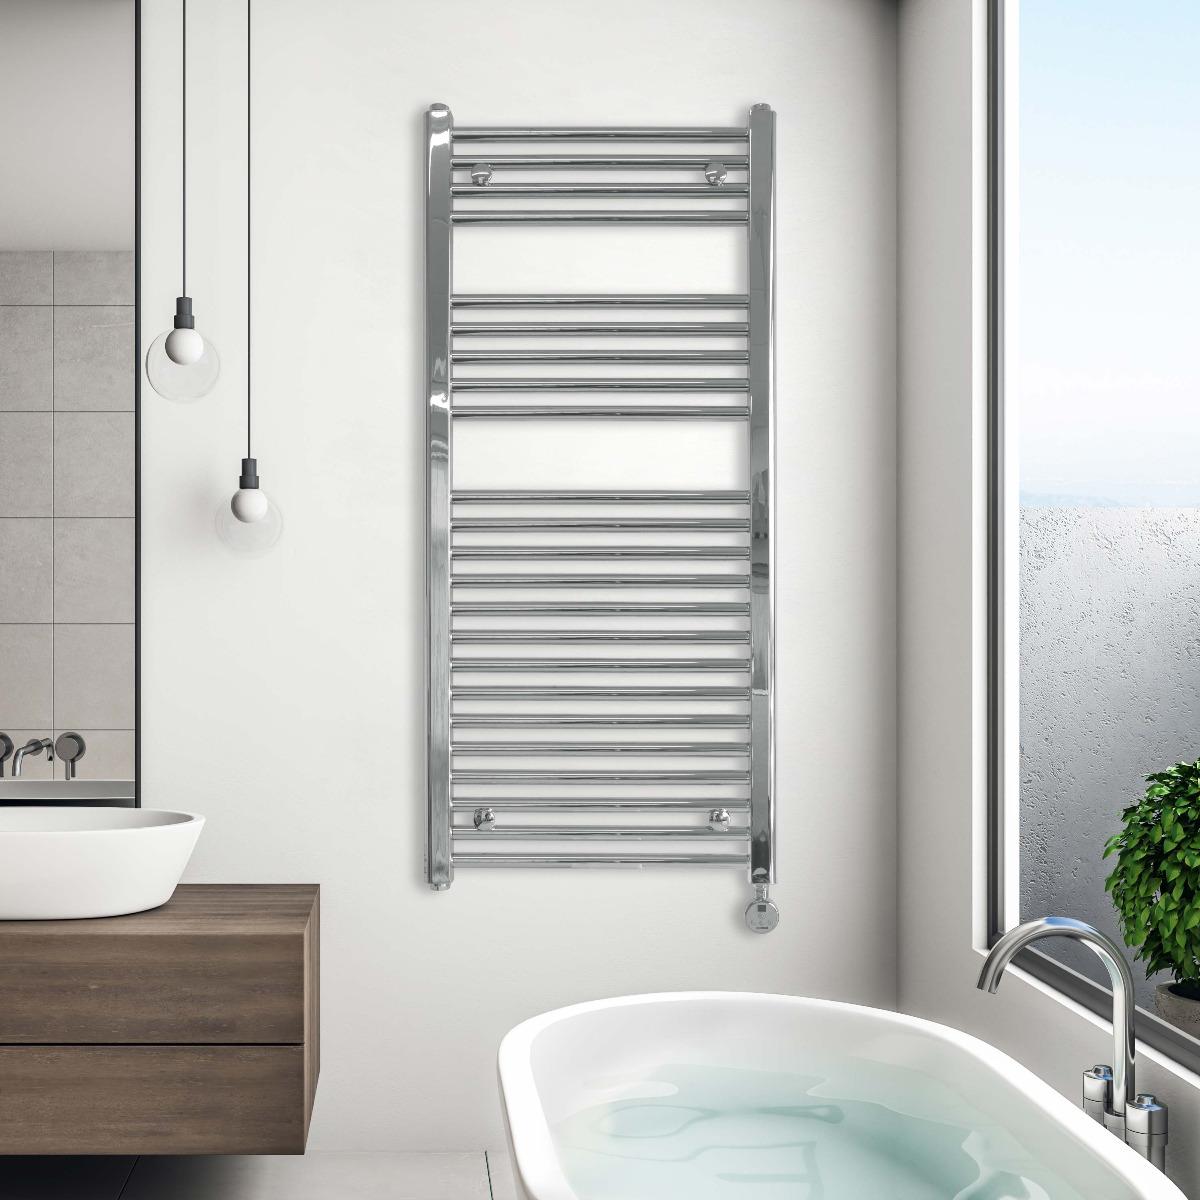 Ecostrad Fina-E Electric Towel Rail